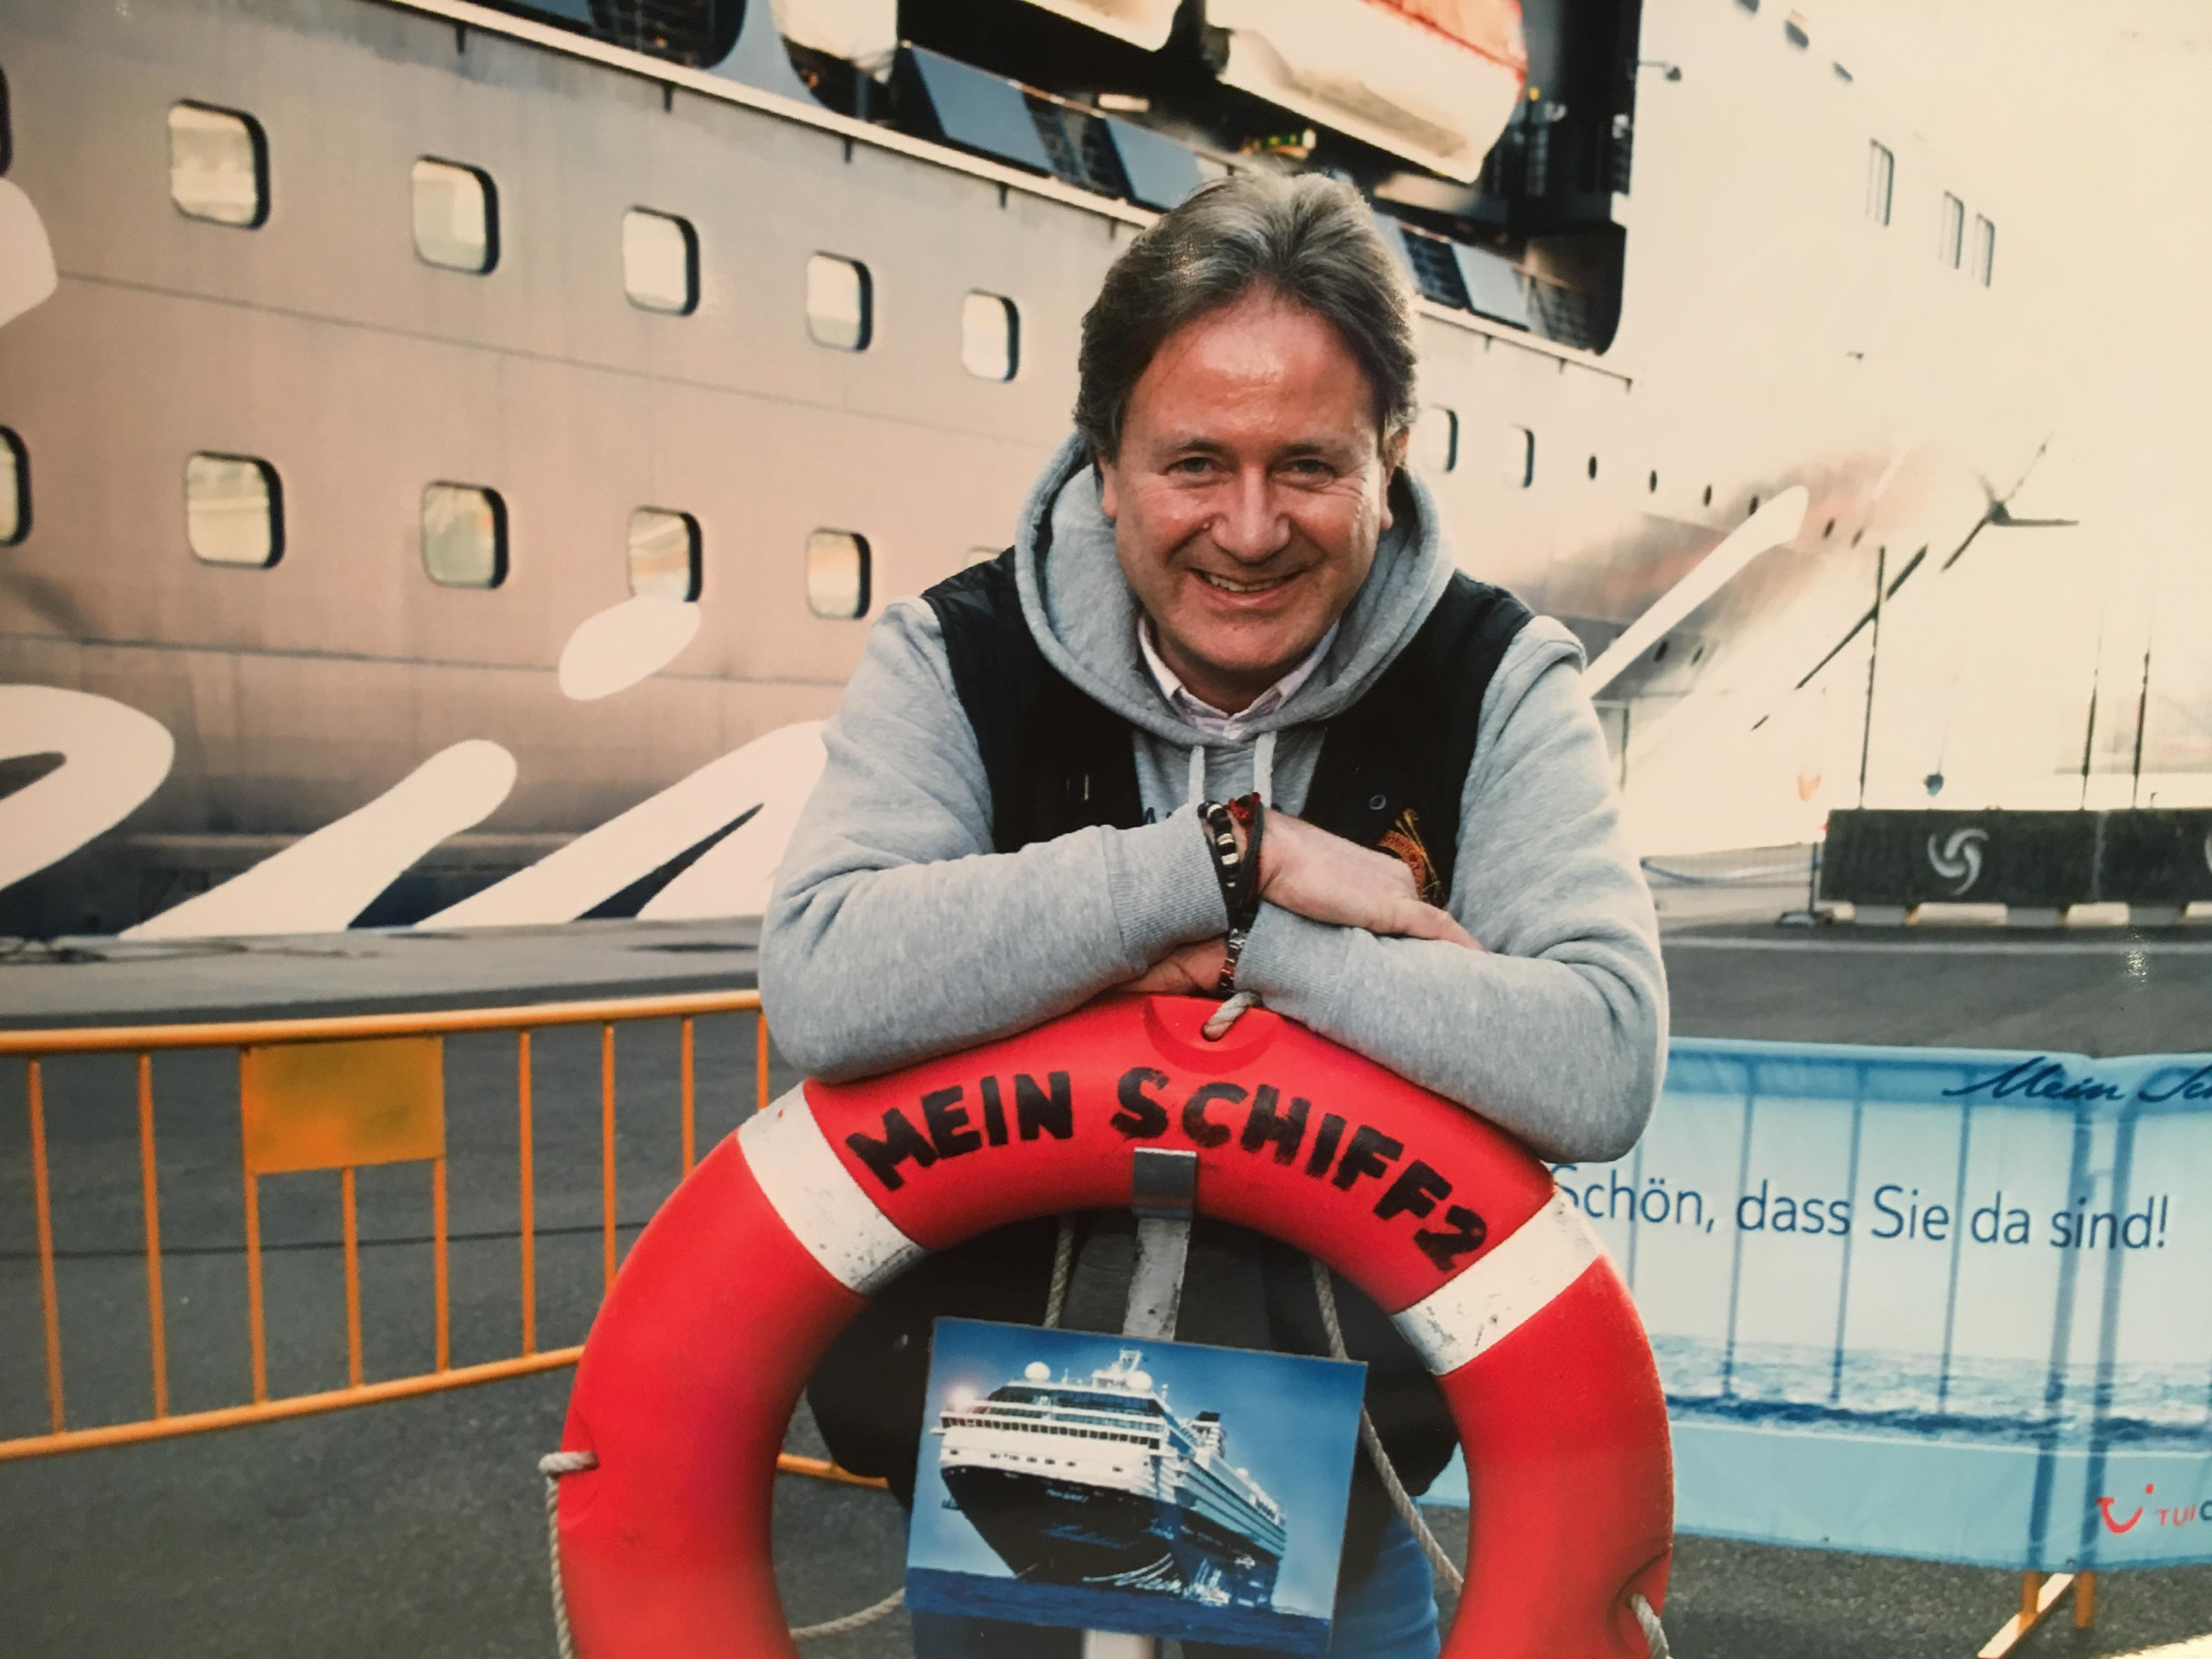 Mein Schiff Fan Frank Behrendt